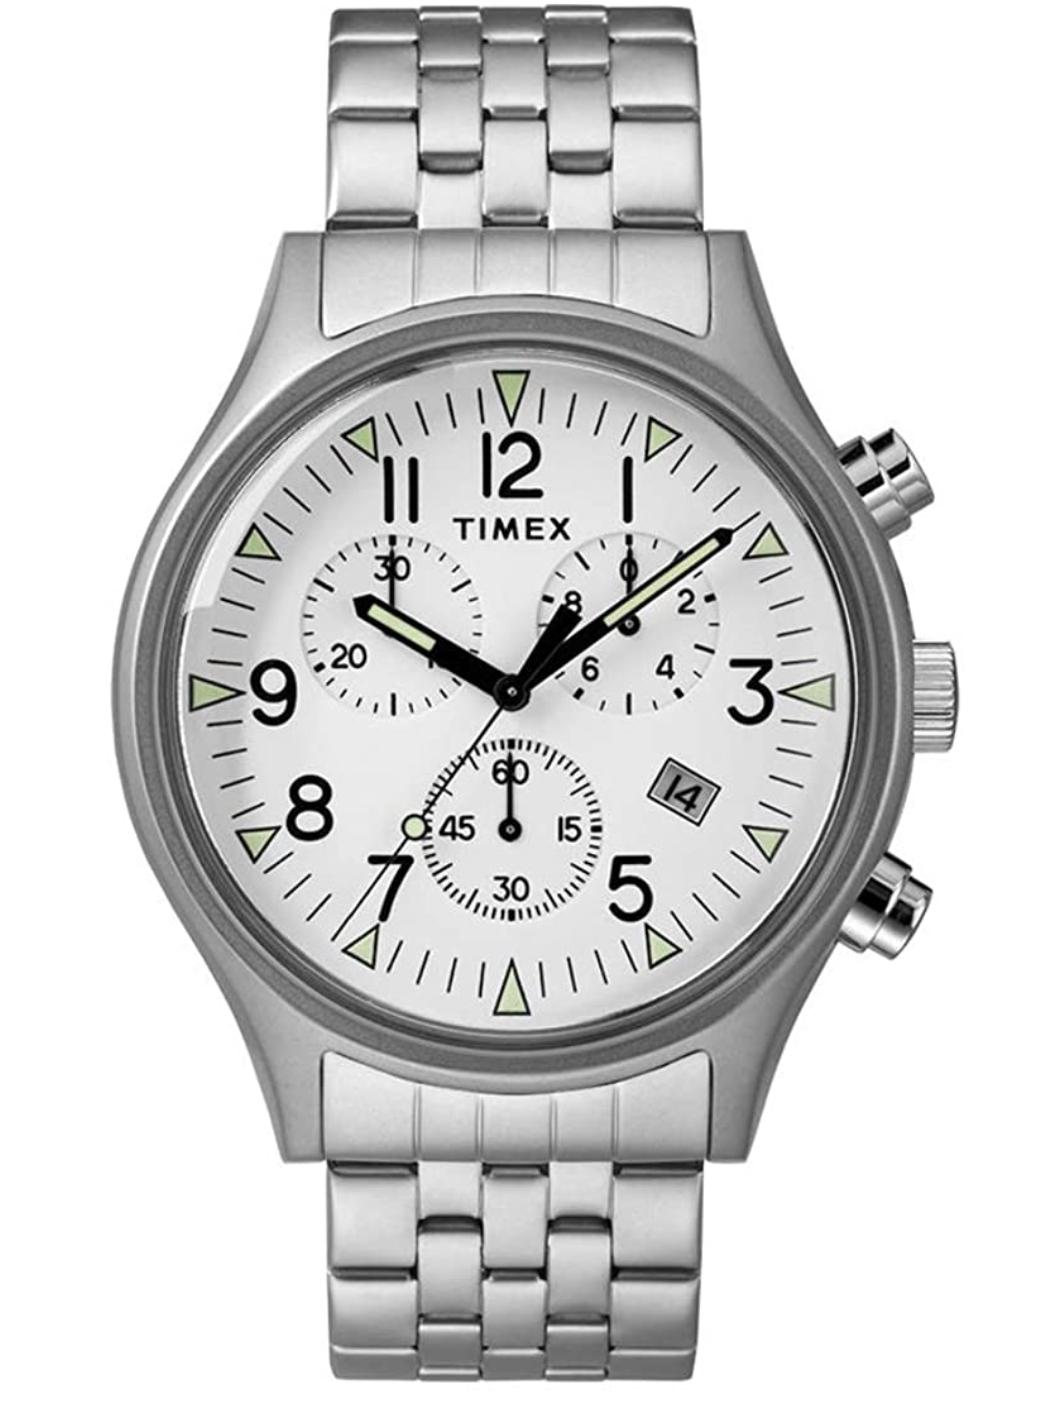 Reloj Timex para Hombre - TW2R68900